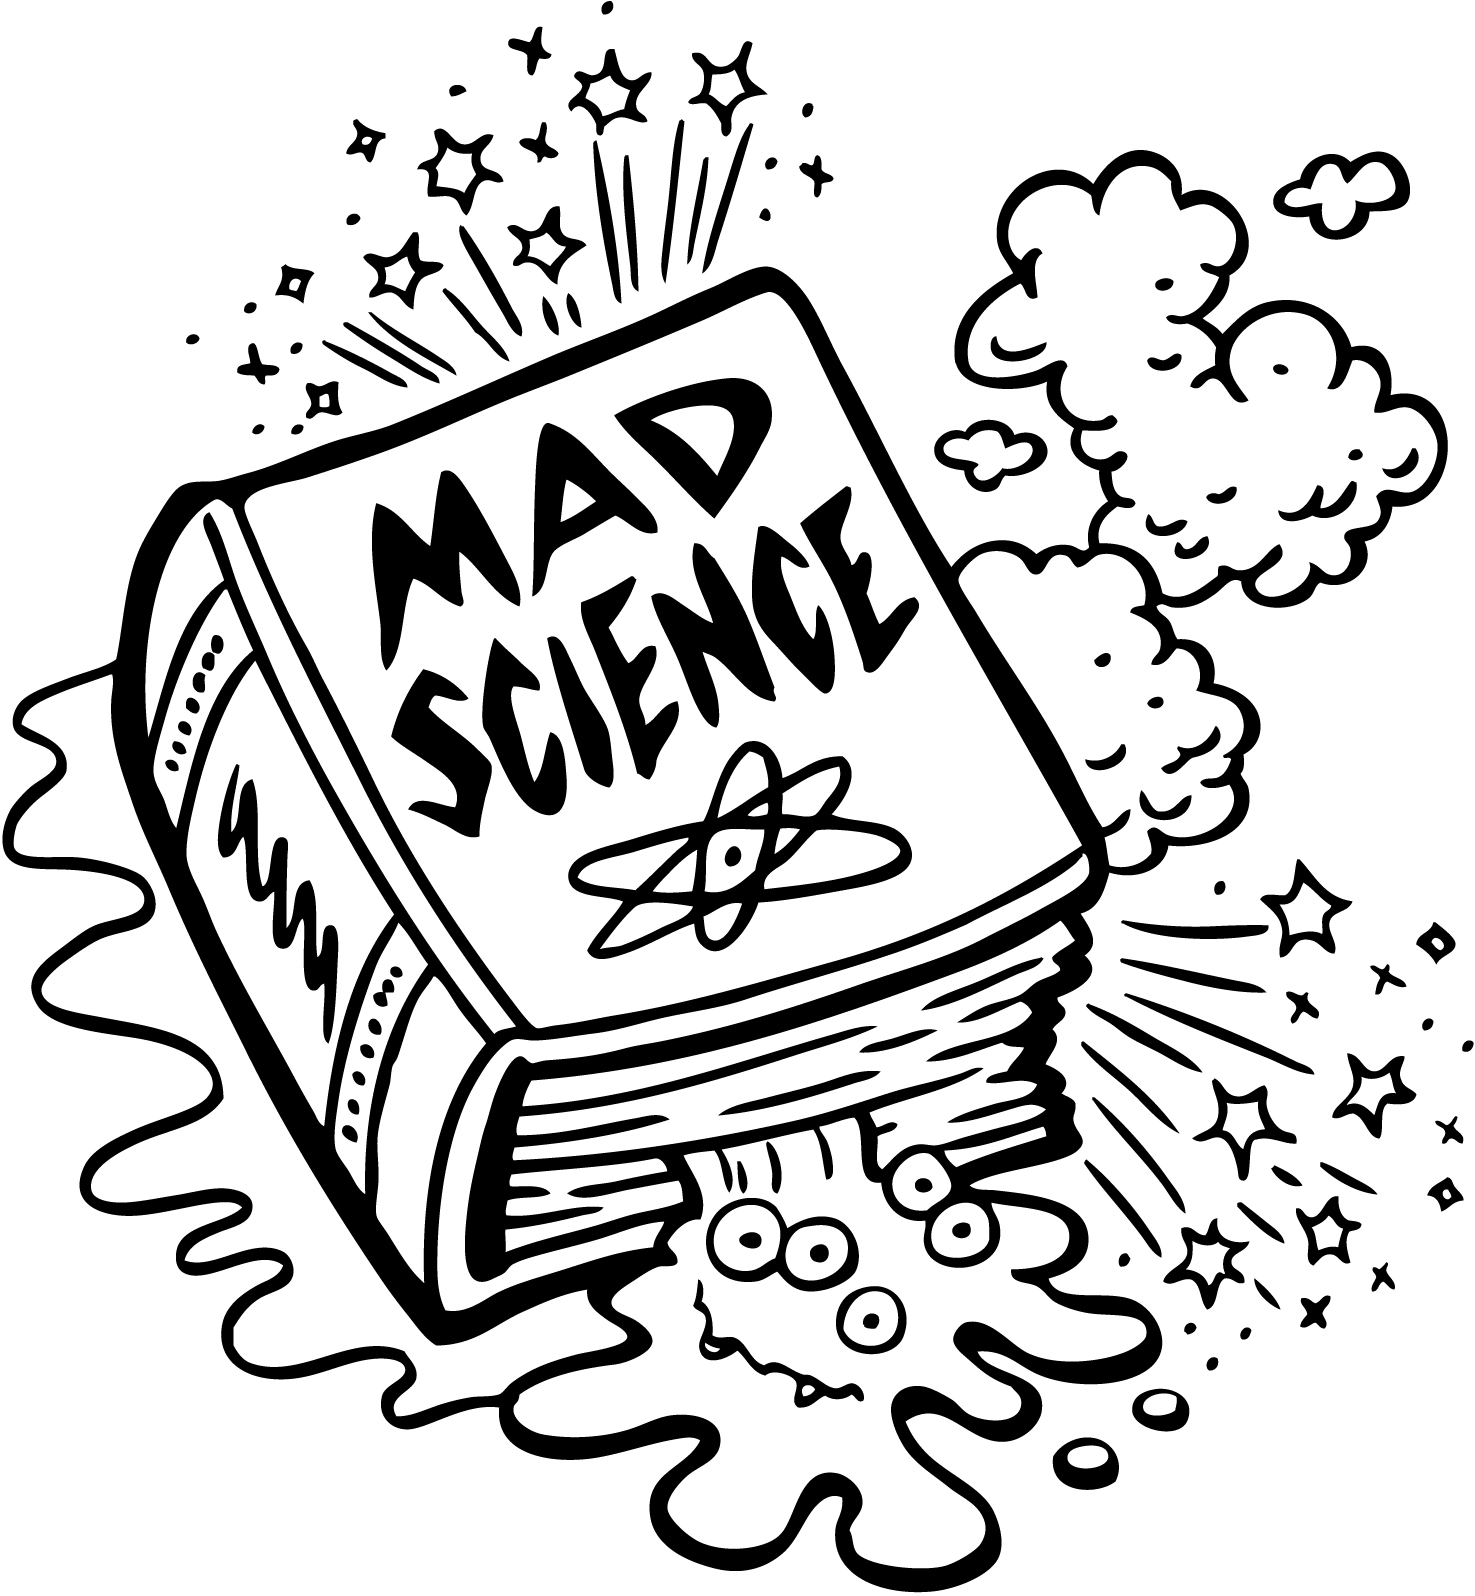 Mad Scientist Drawing At Getdrawings